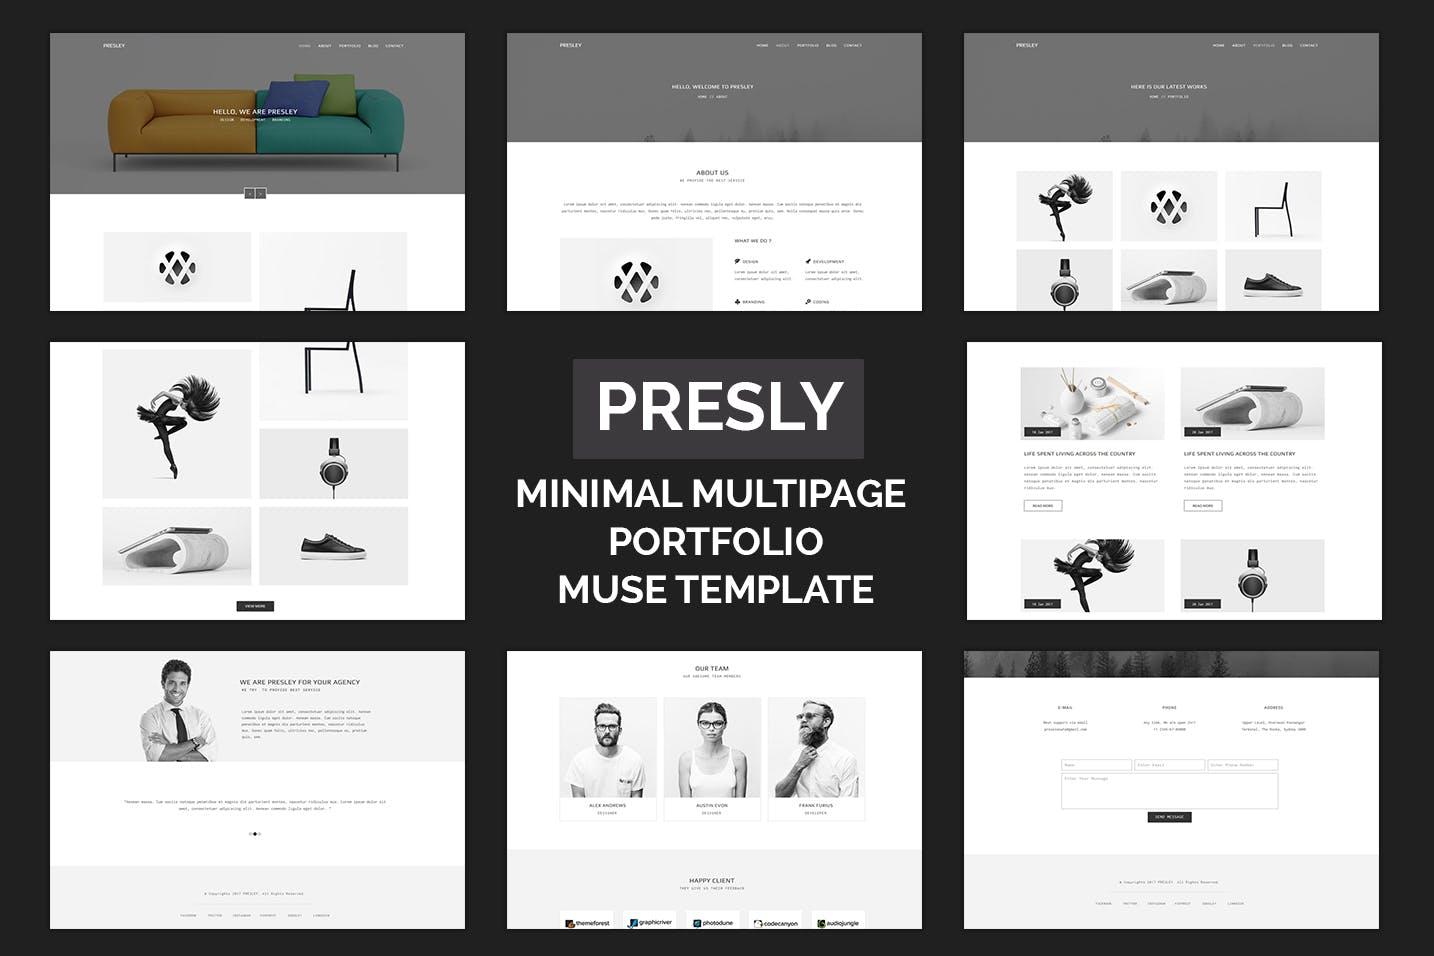 Presley - Minimal Multipage Portfolio Muse Templat